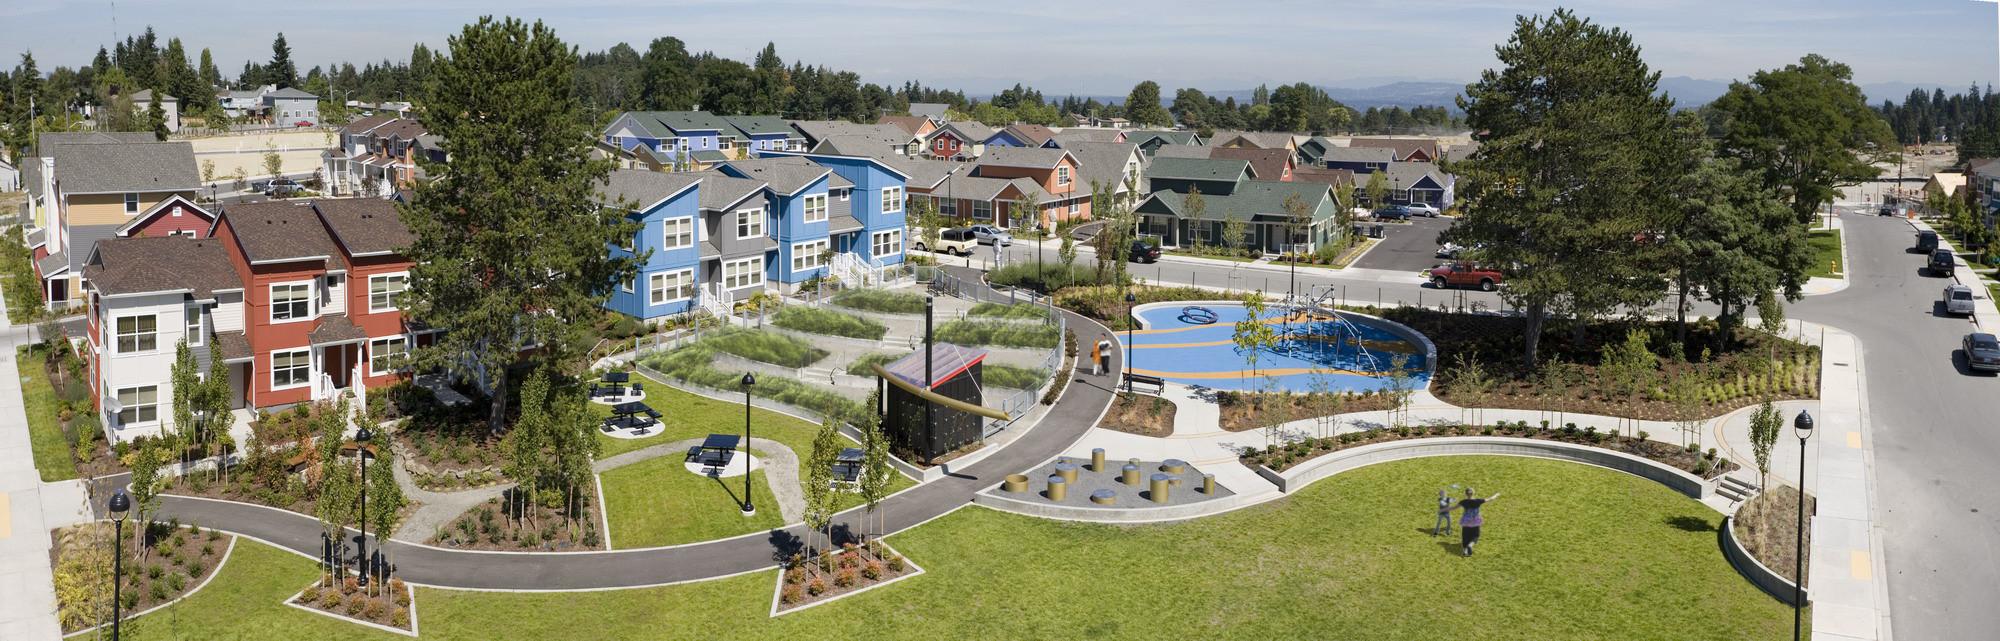 Greenbridge, King County, Washington. Photo: Steve Keating Photography